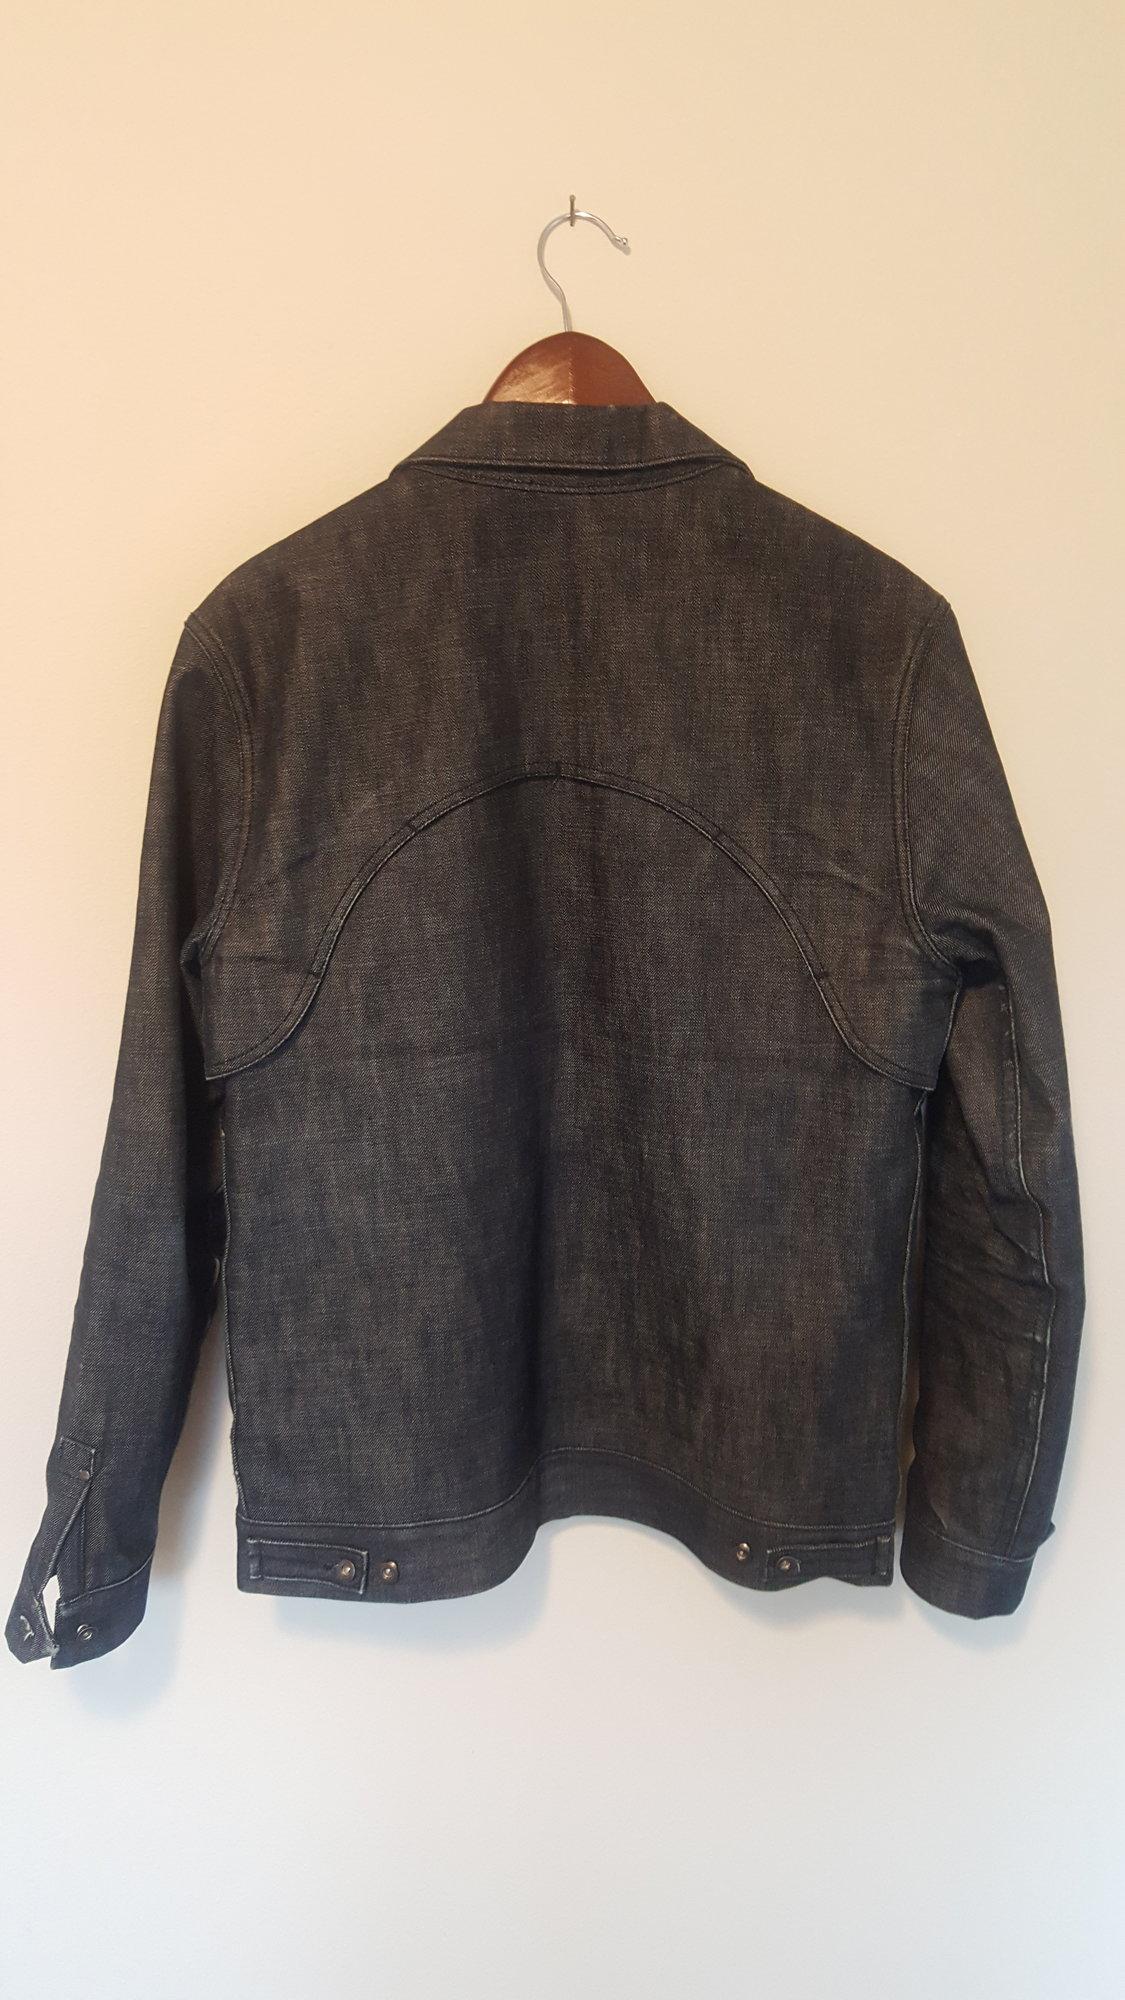 jacket3 2.jpg